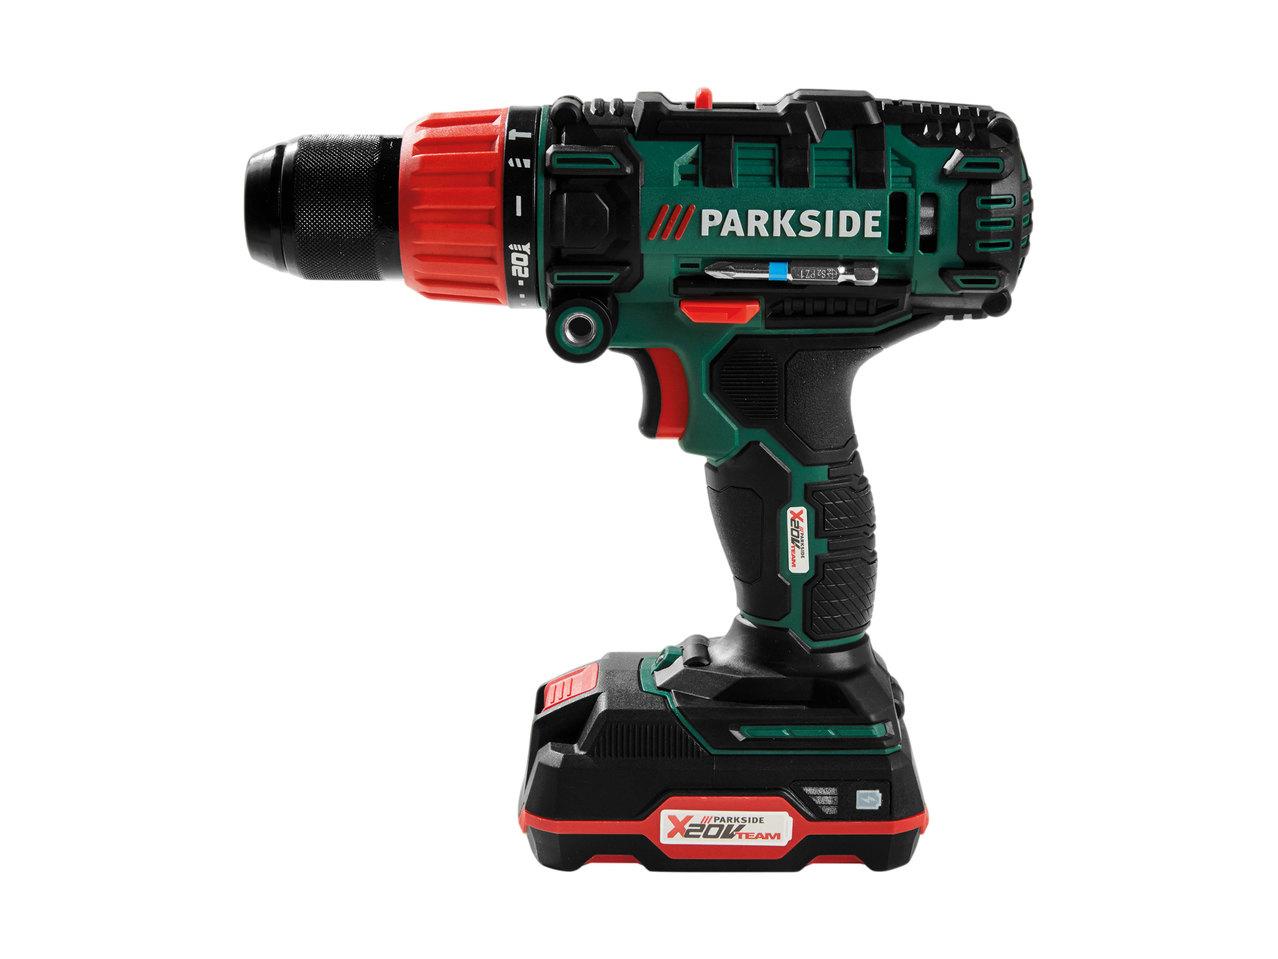 Parkside X 20V Cordless Team : Hammer Drill - £39.99 | Circular Saw - £49.99 instore at Lidl